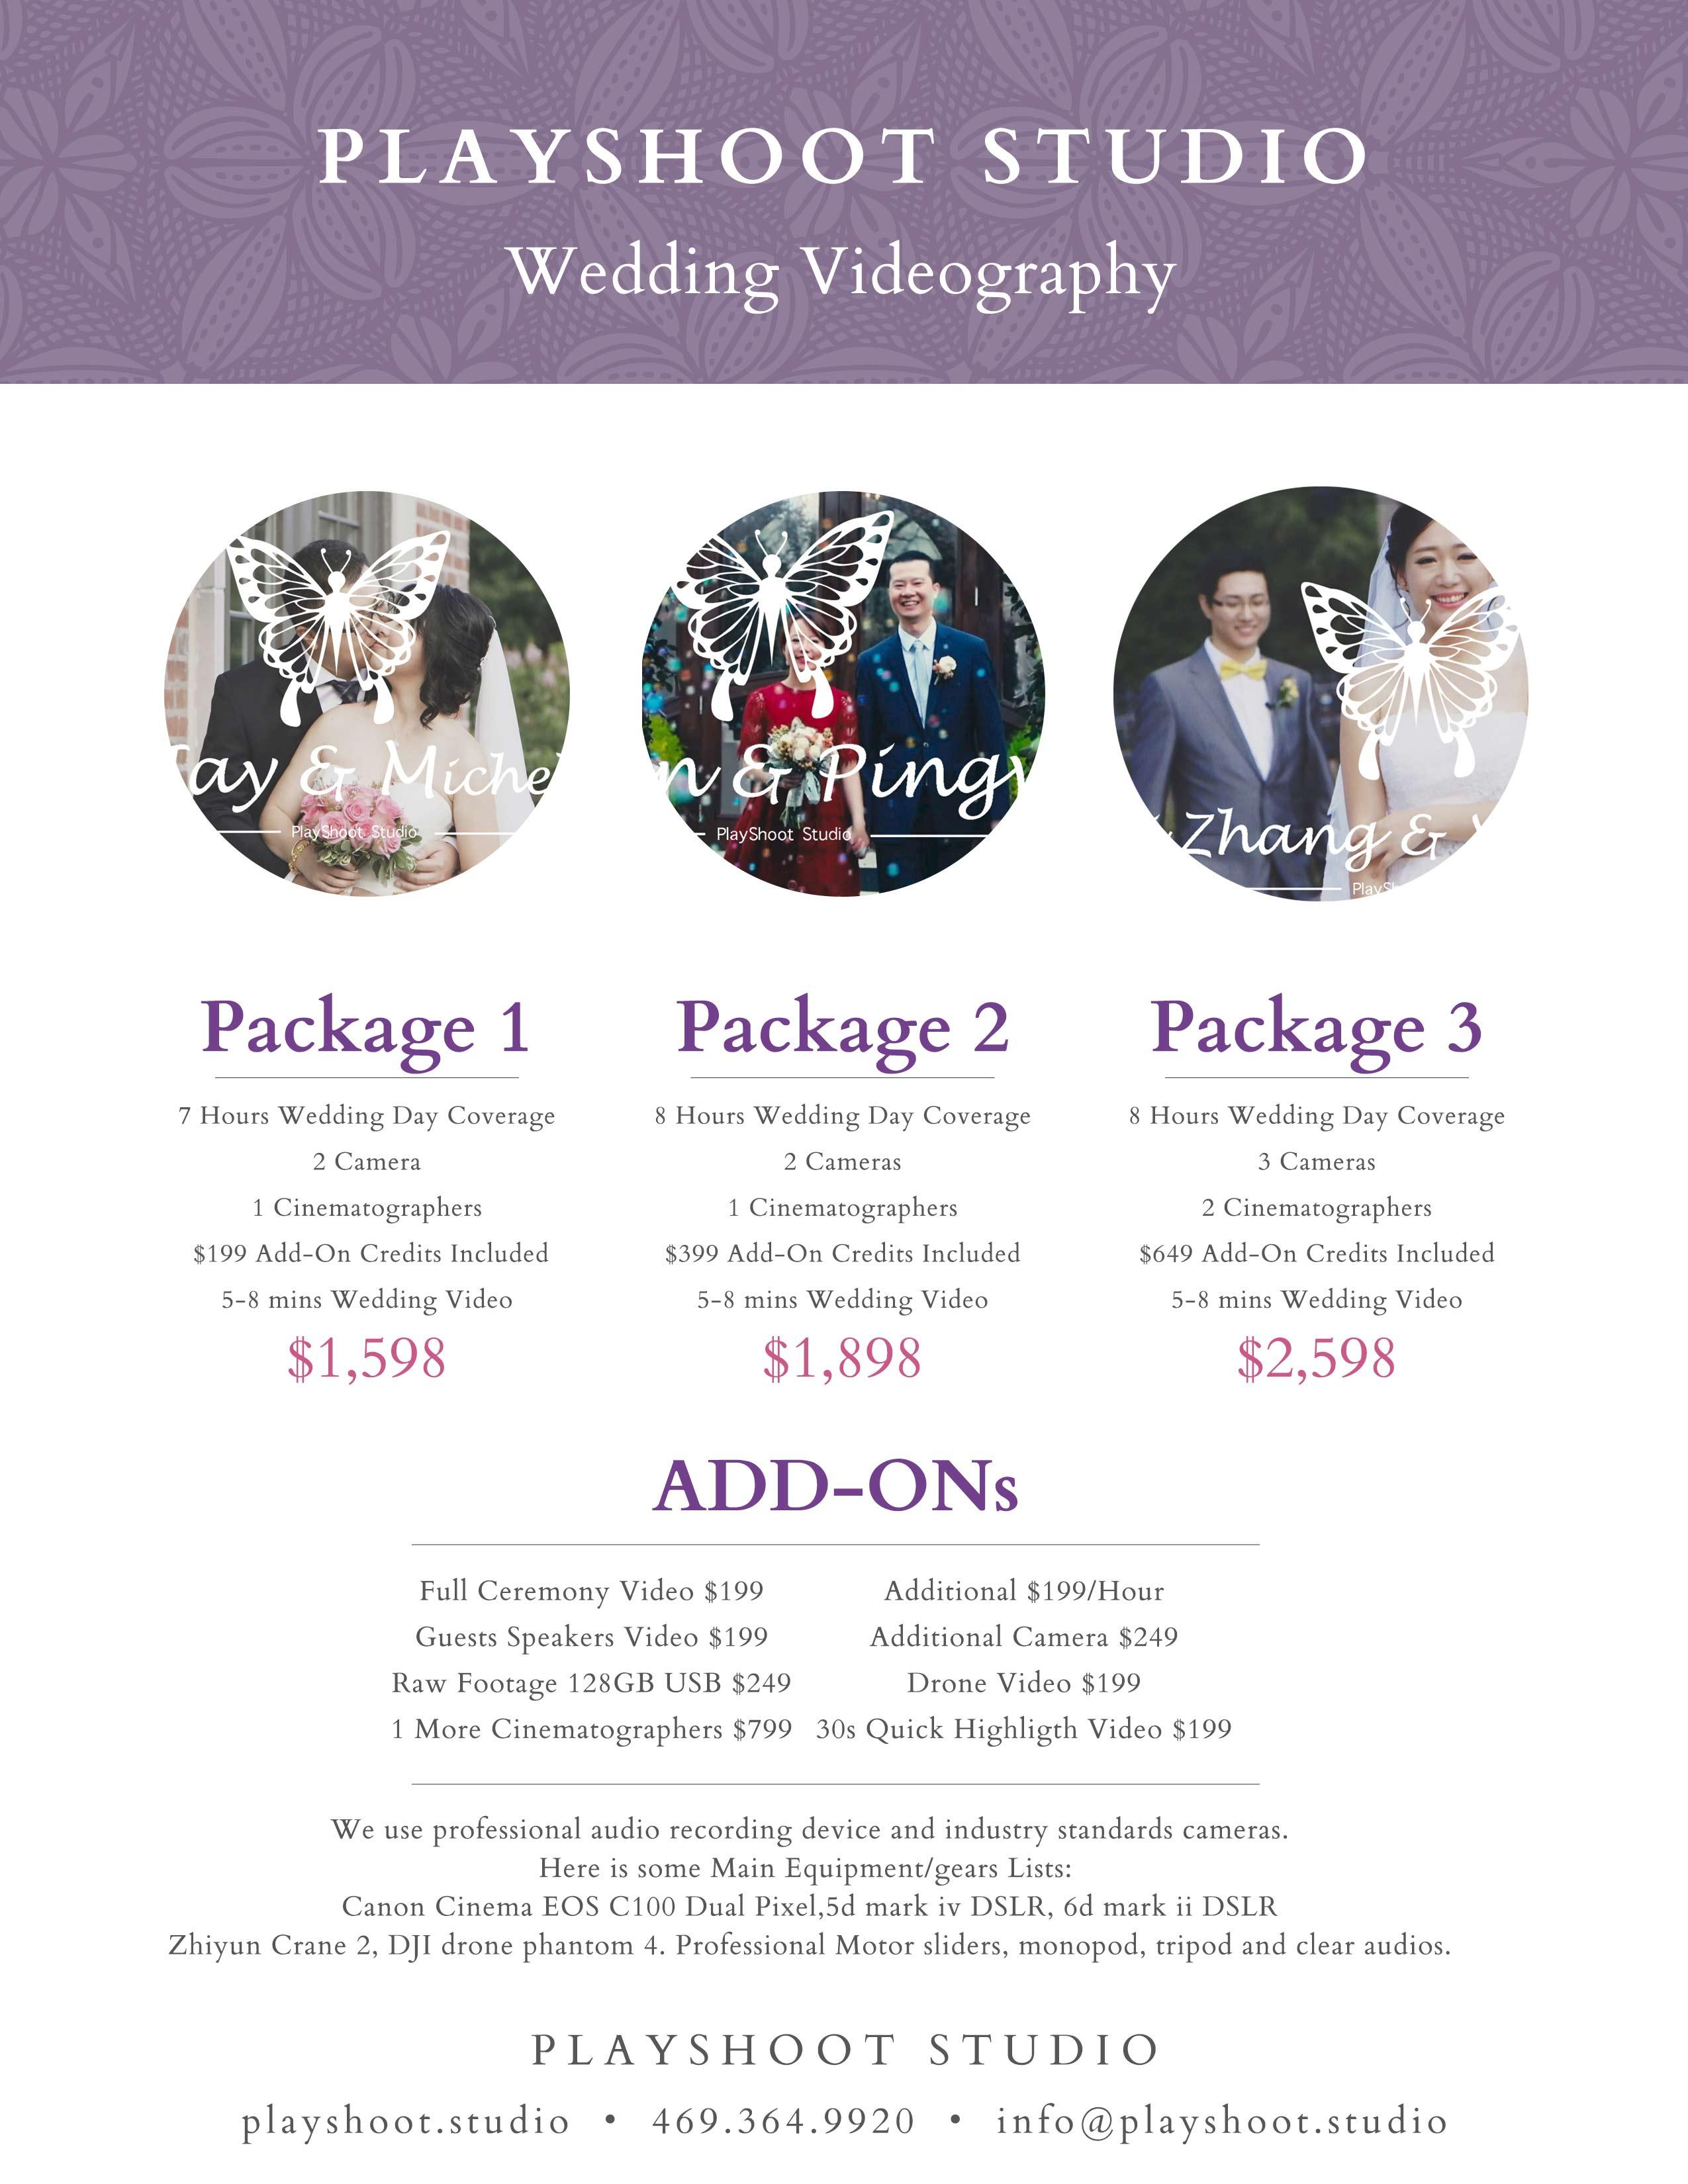 Wedding Videography 2020 Pricing - PlayShoot Studio